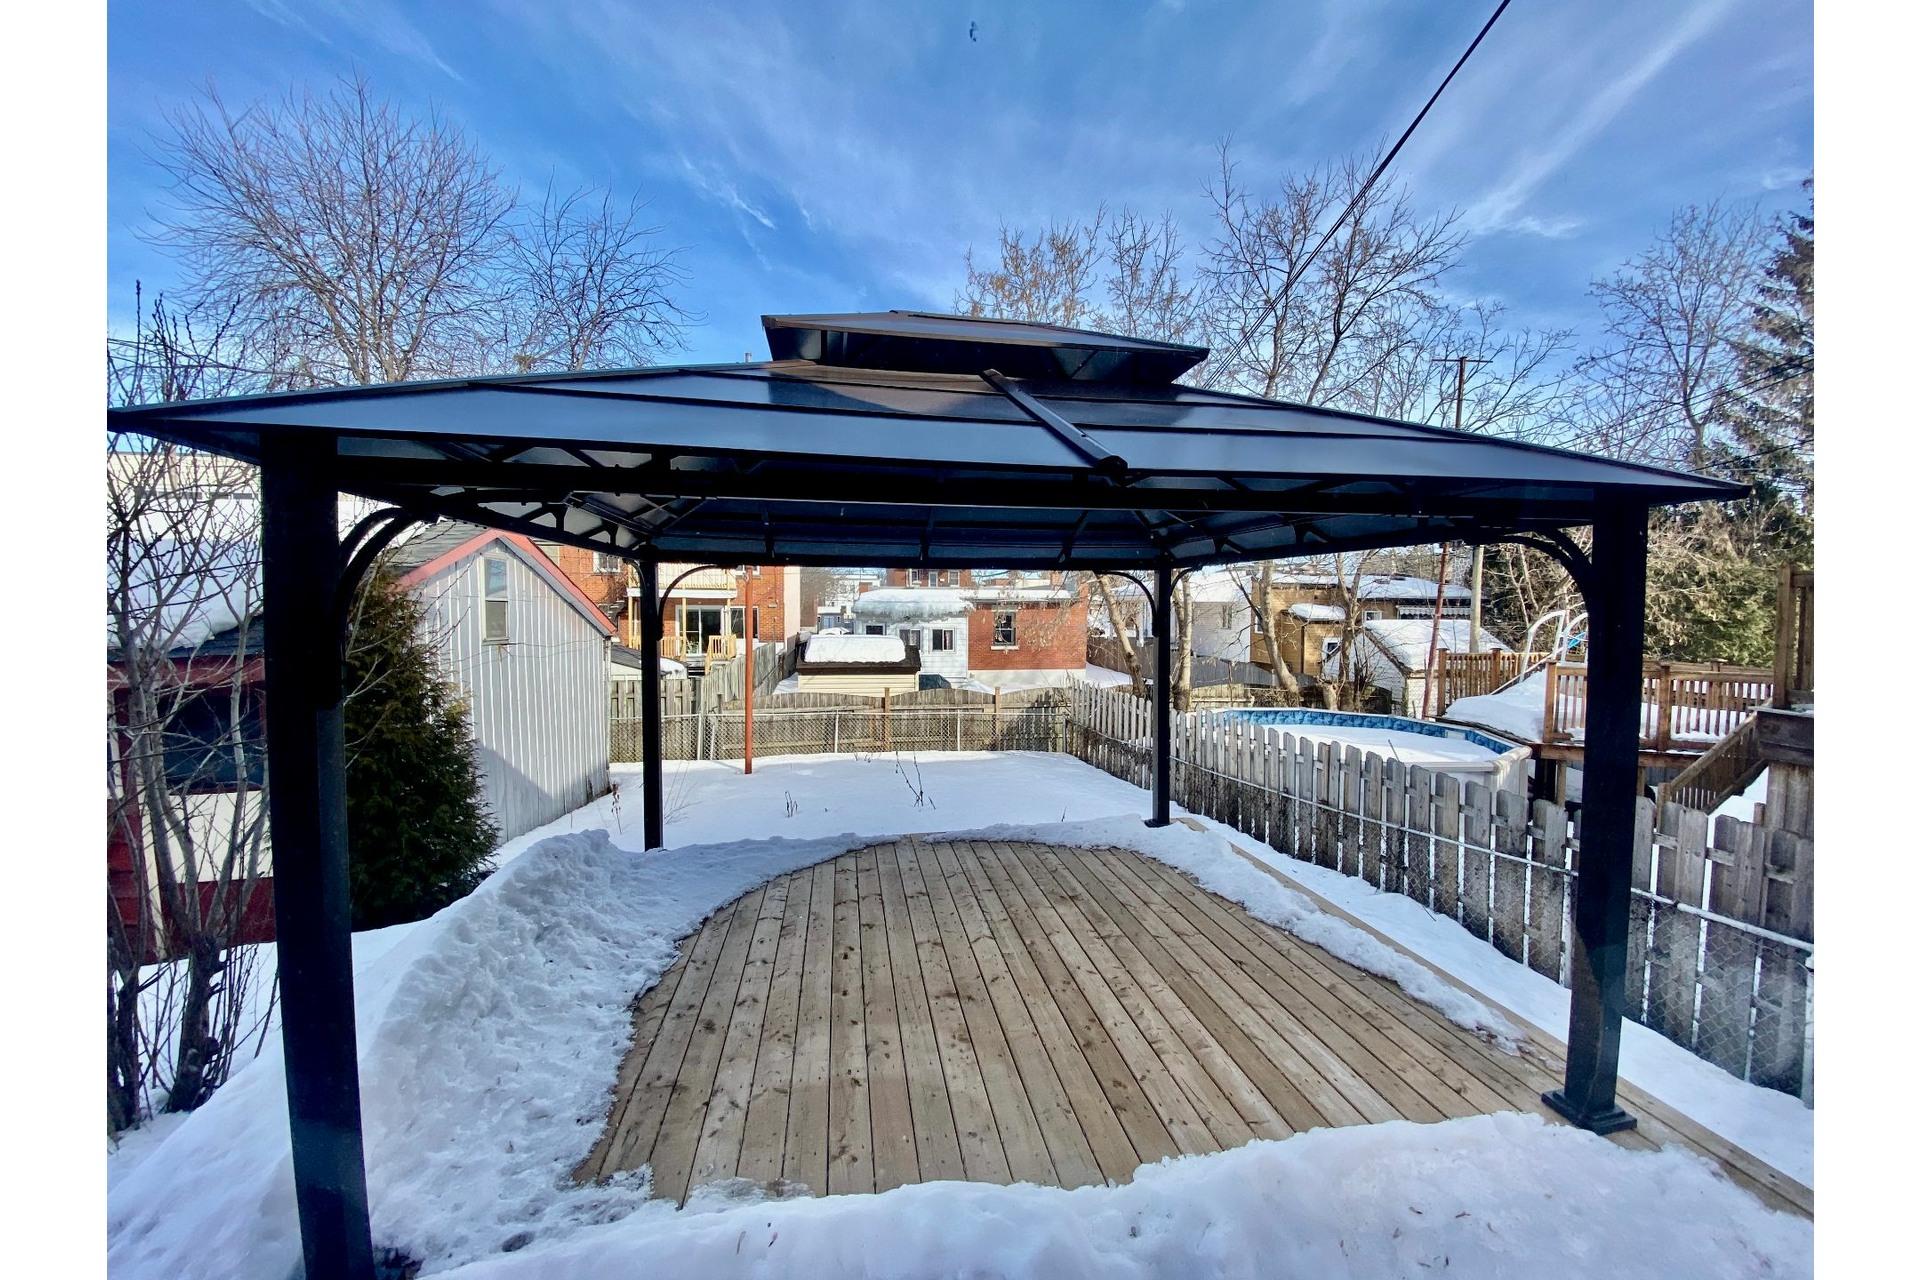 image 22 - Duplex En venta Lachine Montréal  - 6 habitaciones